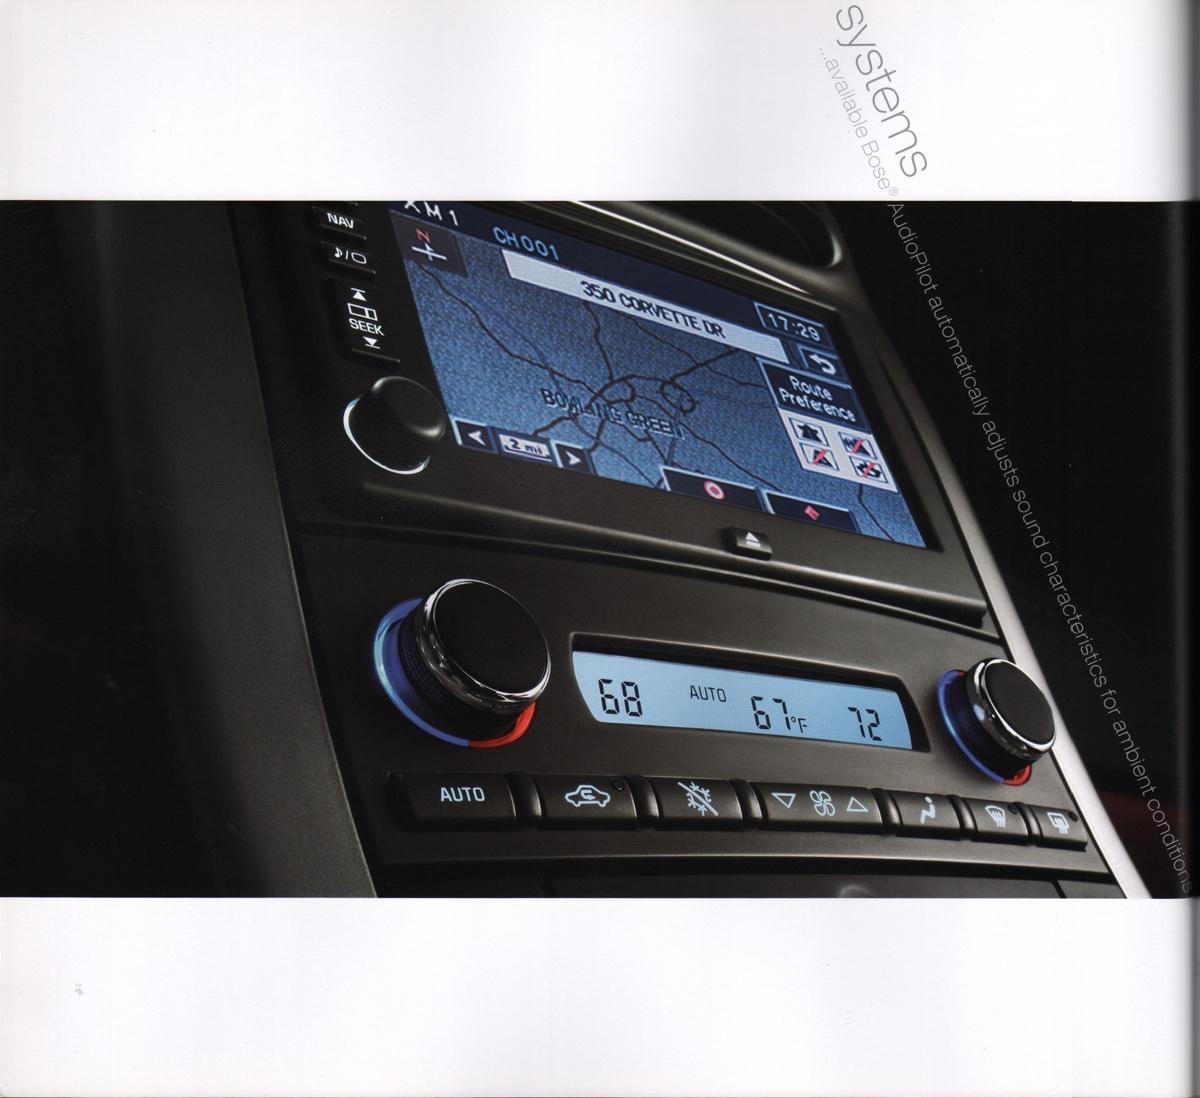 GM 2007 Chevrolet Corvette Sales Brochure